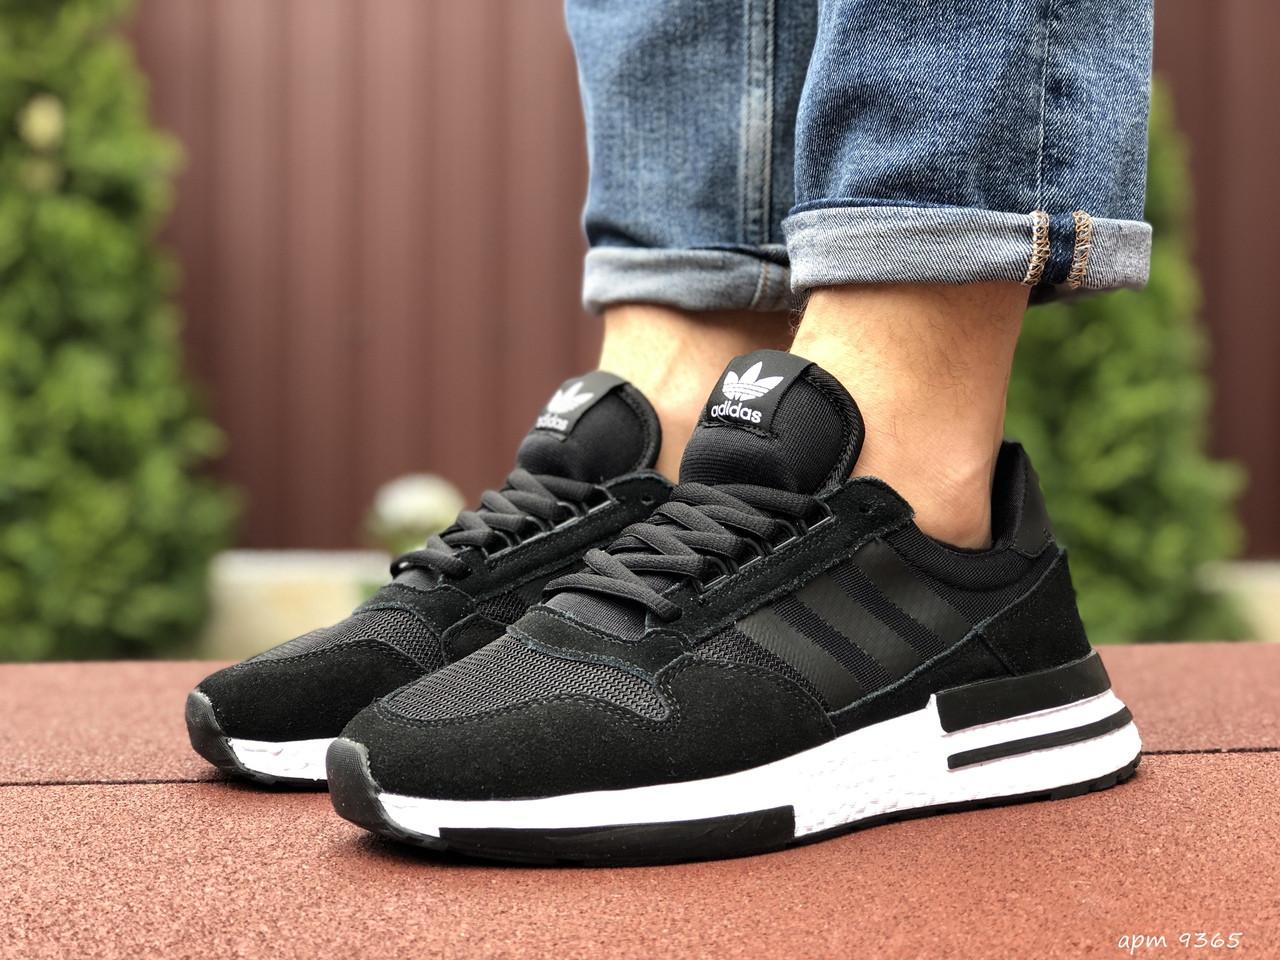 Мужские кроссовки Adidas Zx 500 Rm, черные с белым / кросівки чоловічі адідас (Топ реплика ААА+)